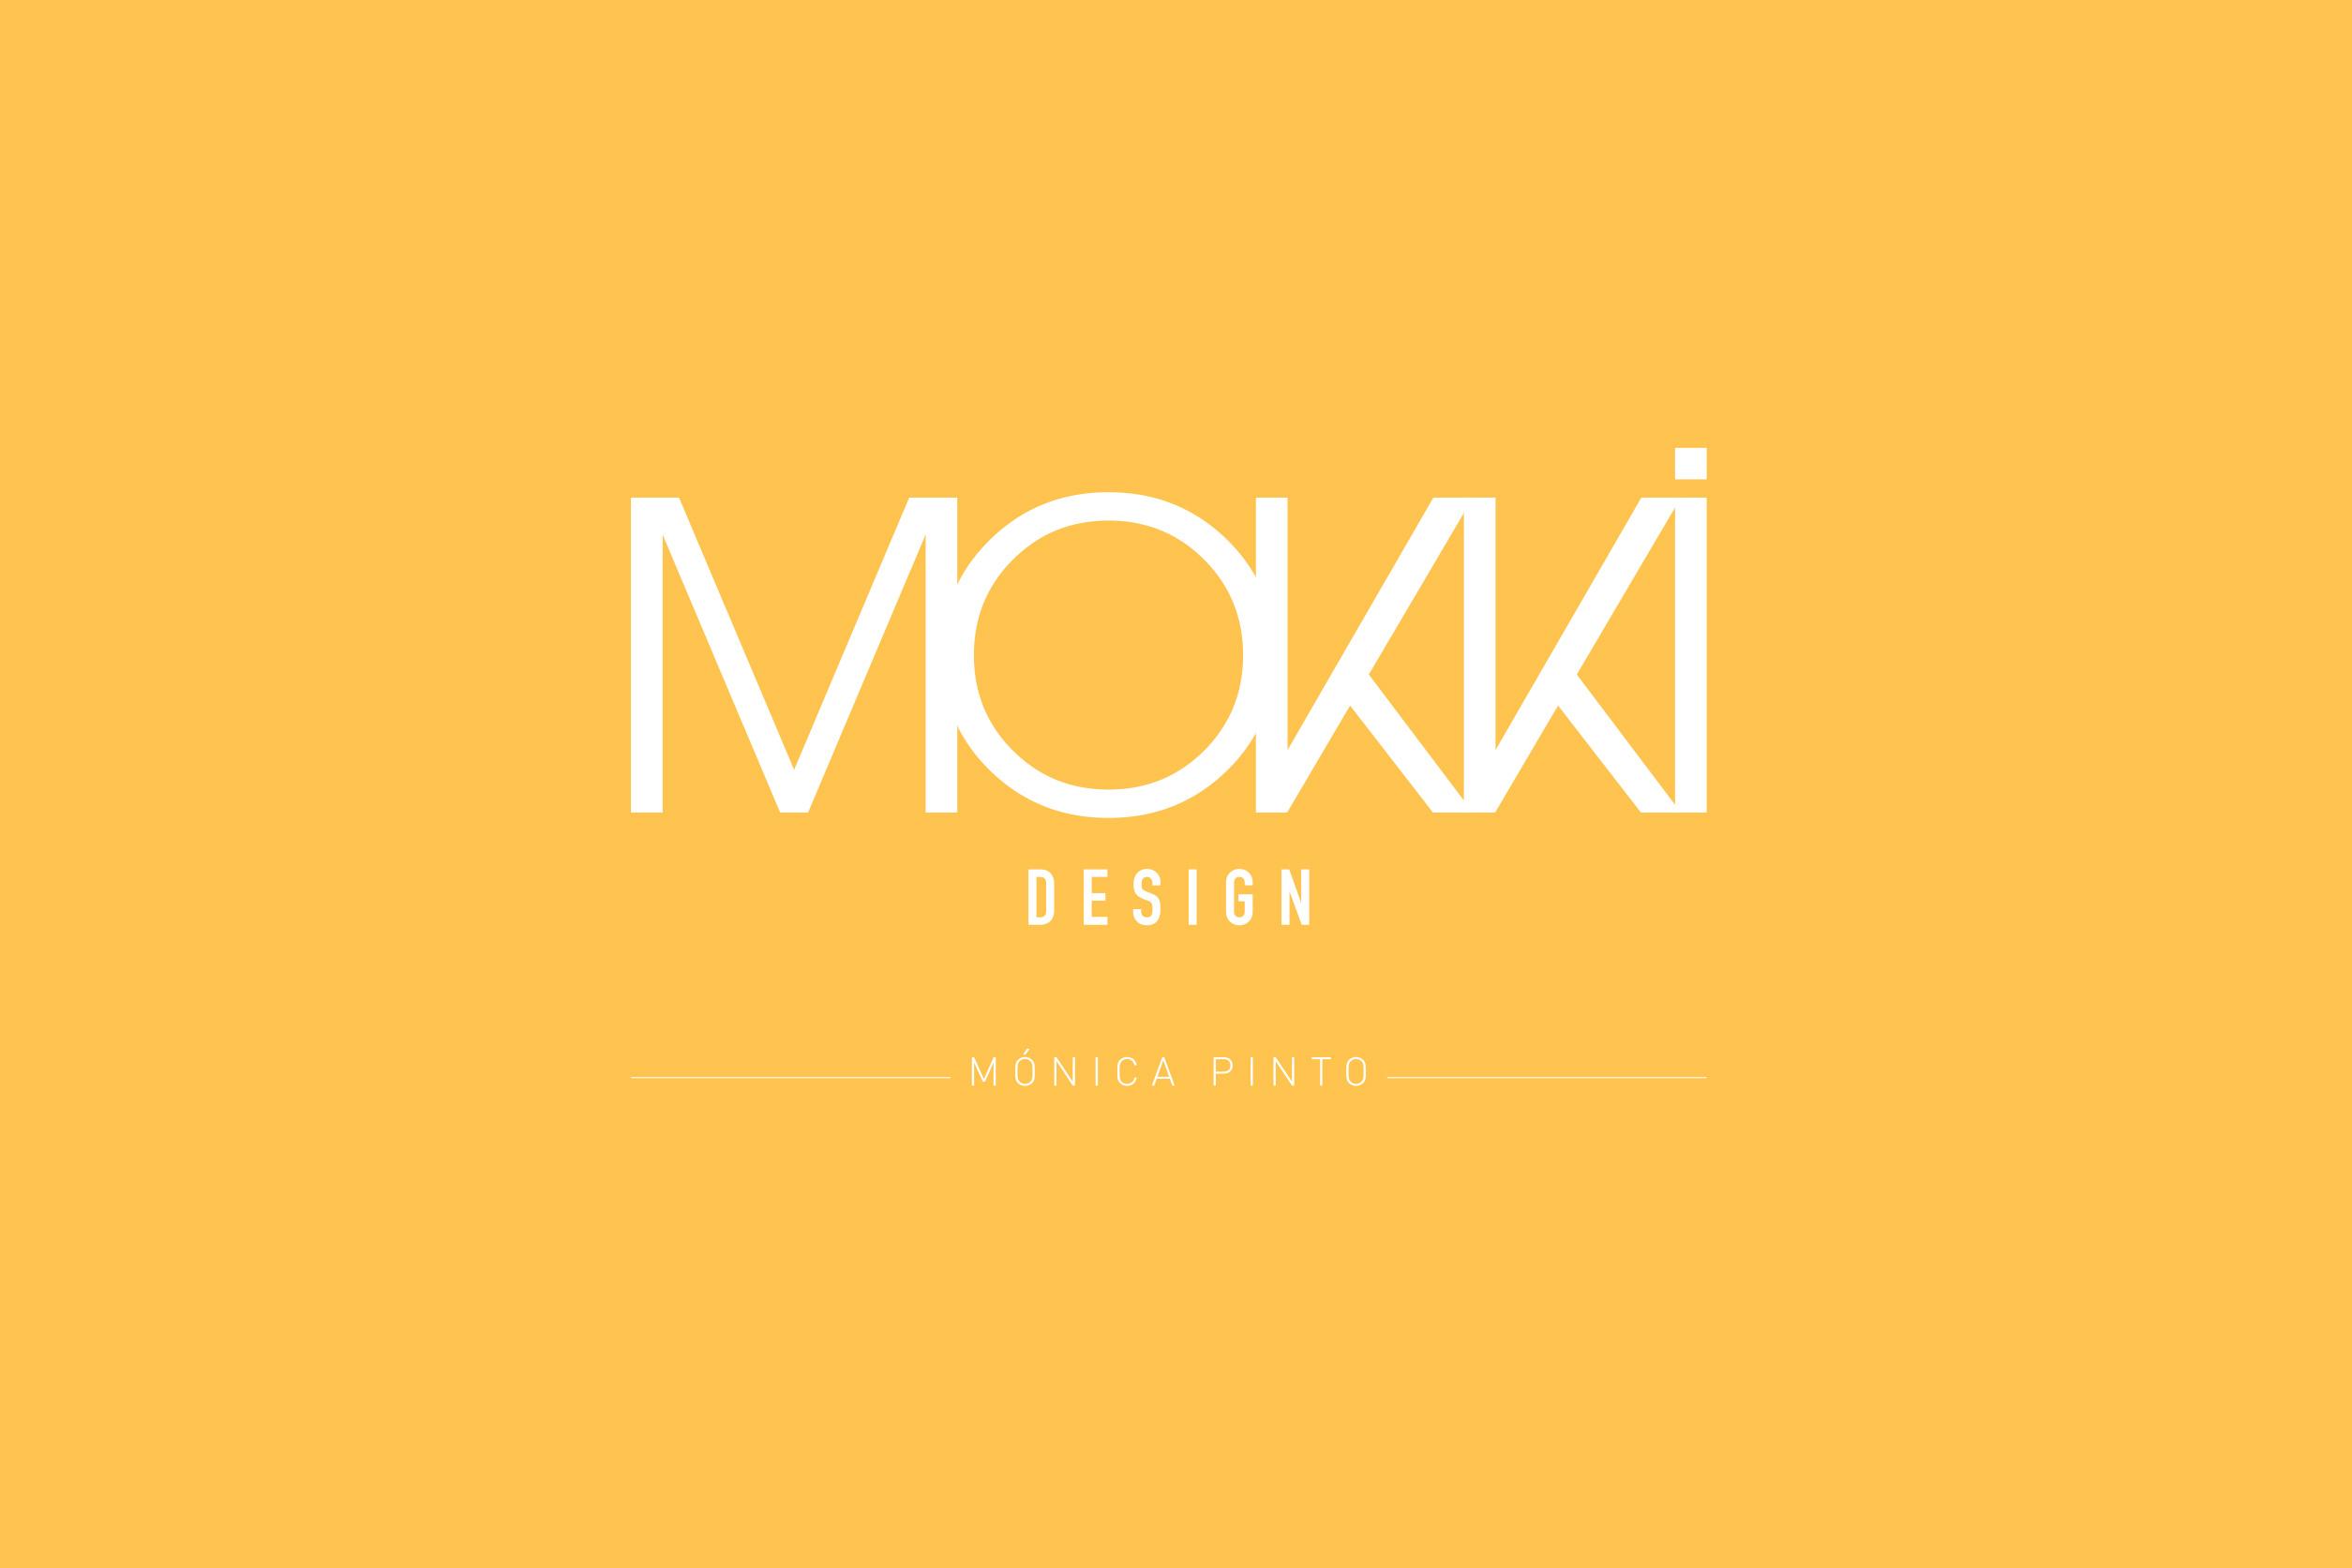 mokki-logo-amarelo